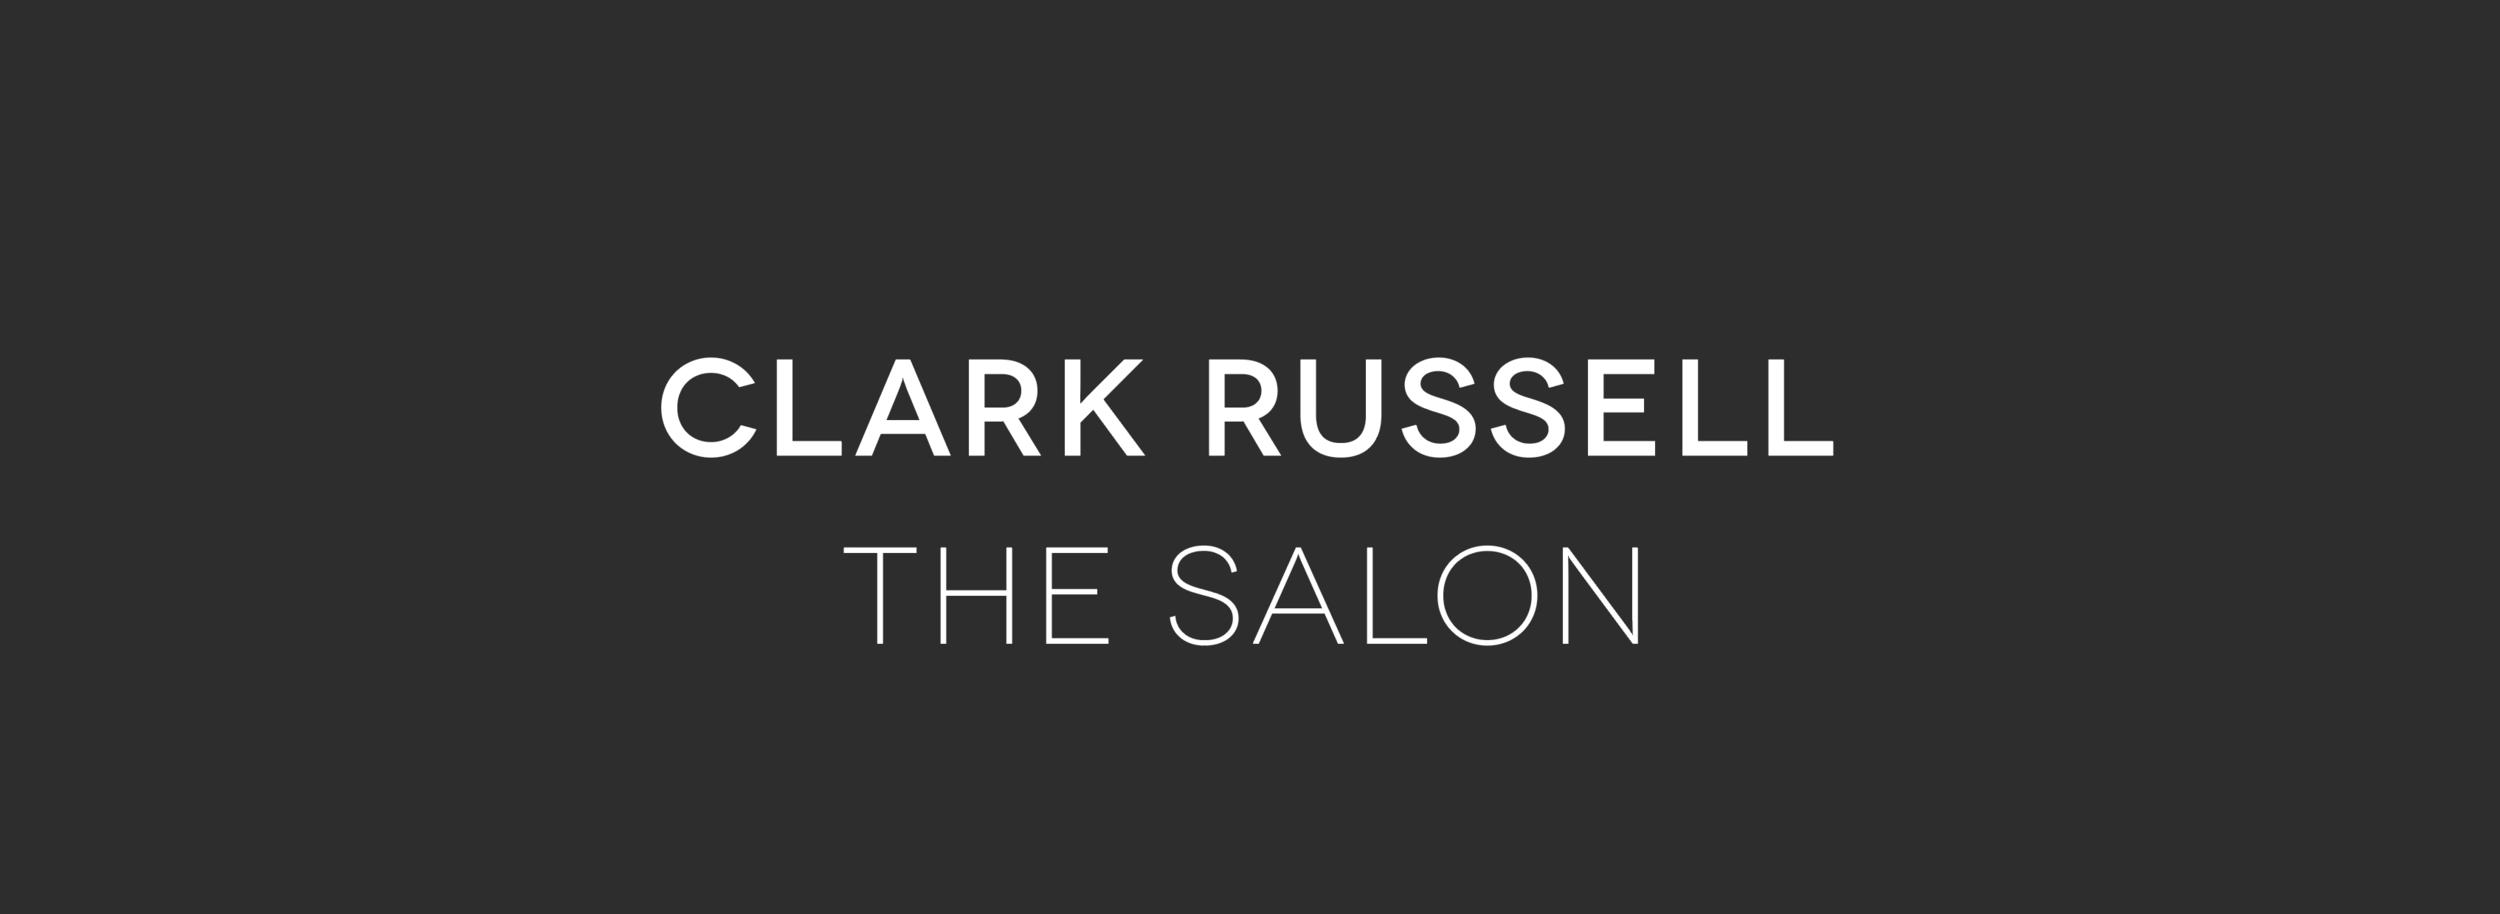 Clark_Russell_The_Salon_BRANDING.png